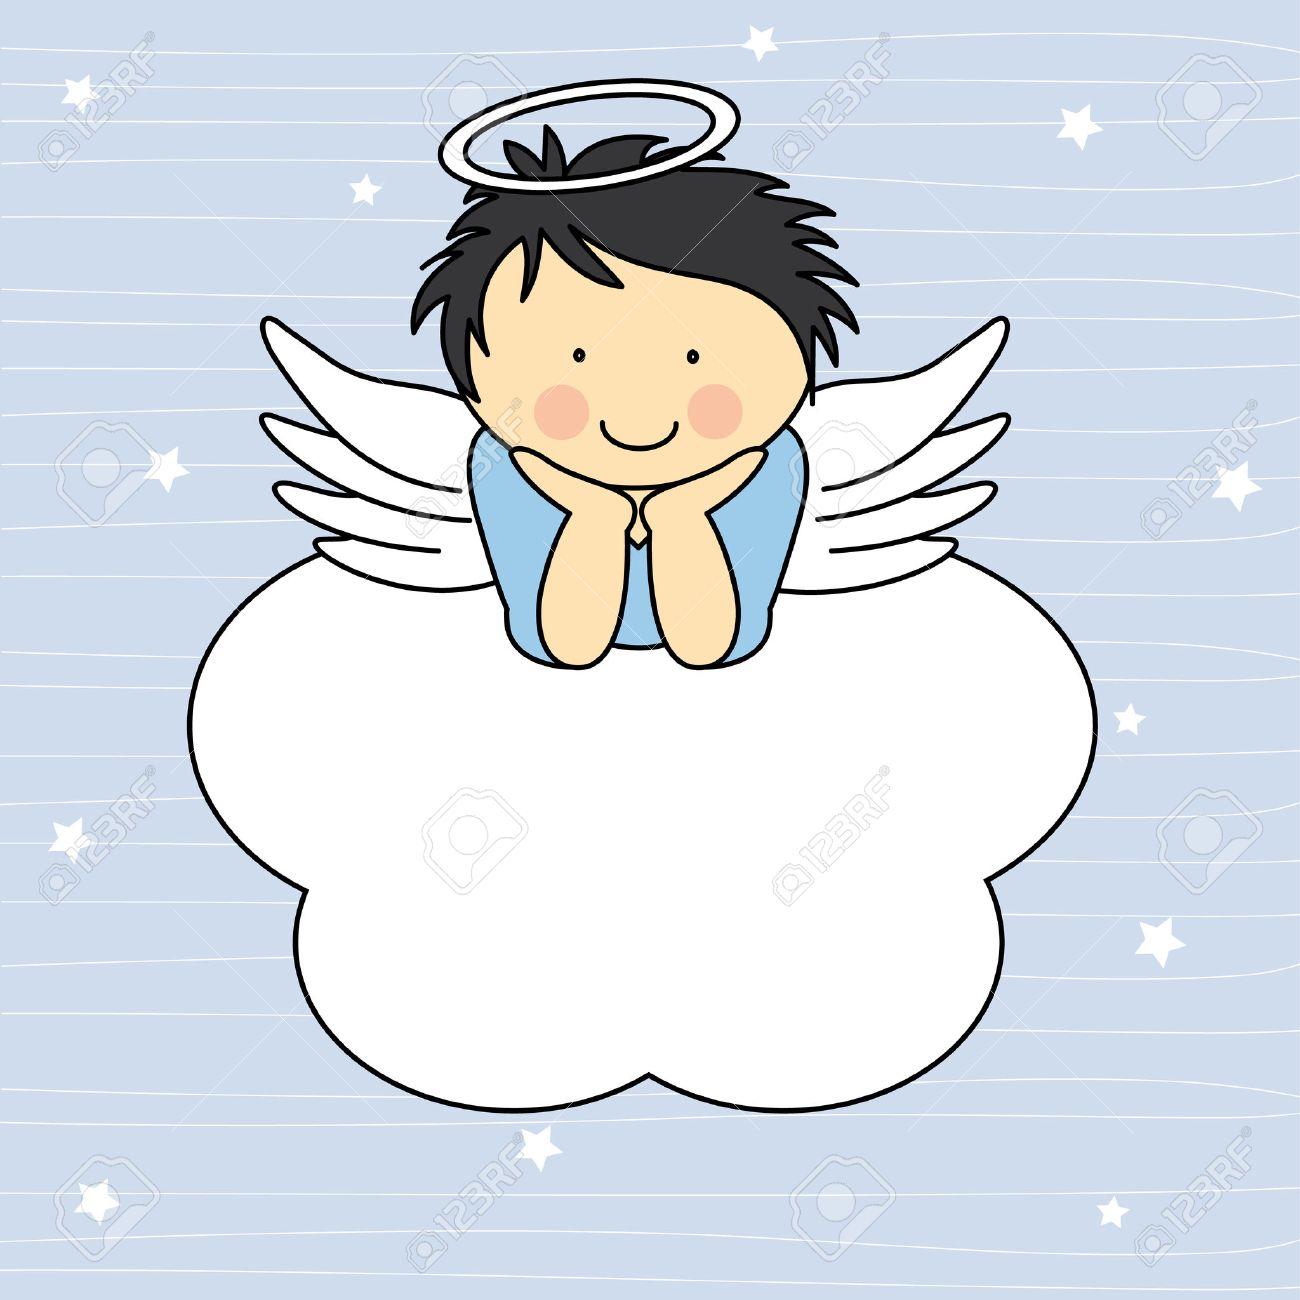 Angel wings on a cloud Greeting card - 26049289